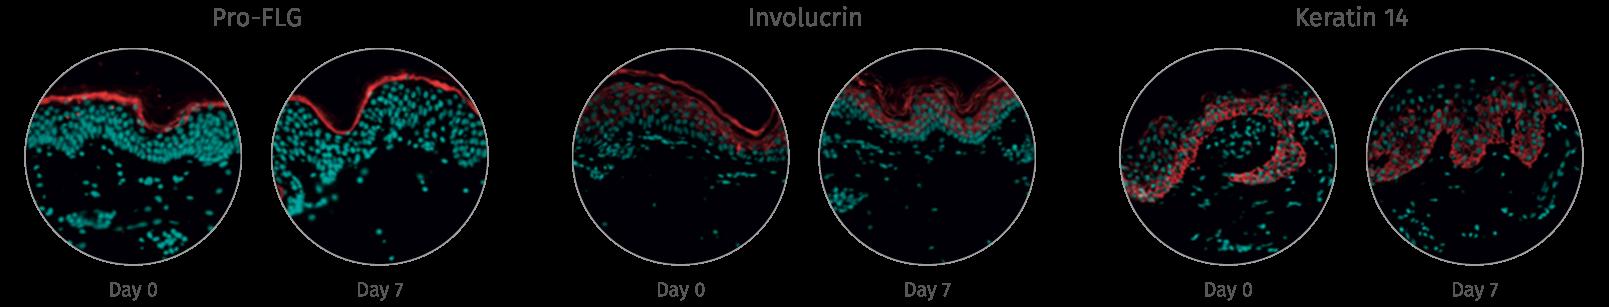 human skin structure and live skin response NativeSkin models